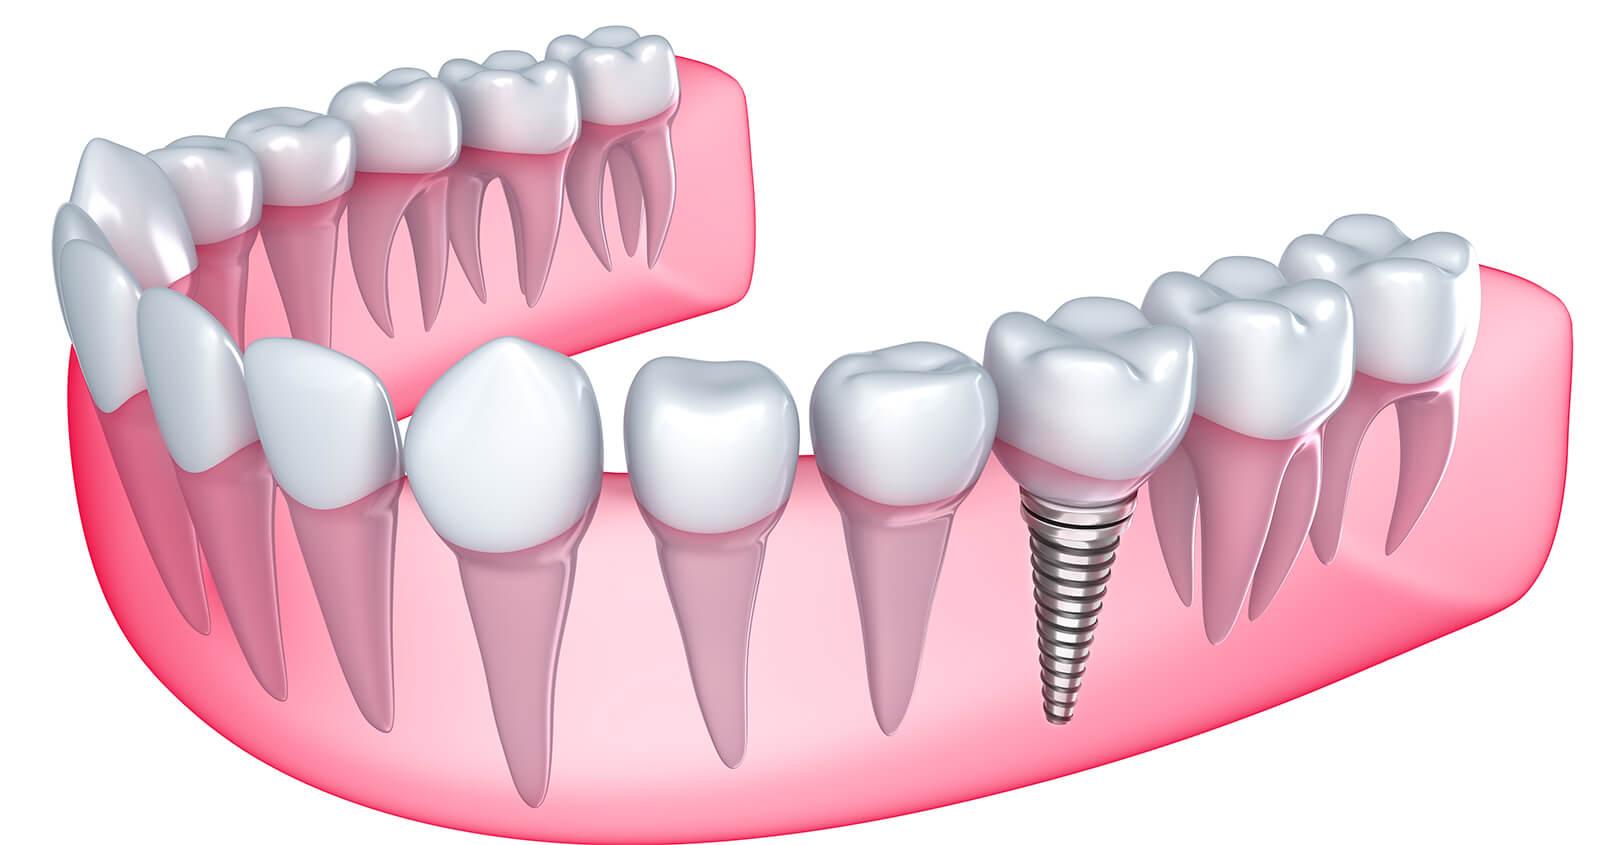 Teeth Implants in Azusa CA Area